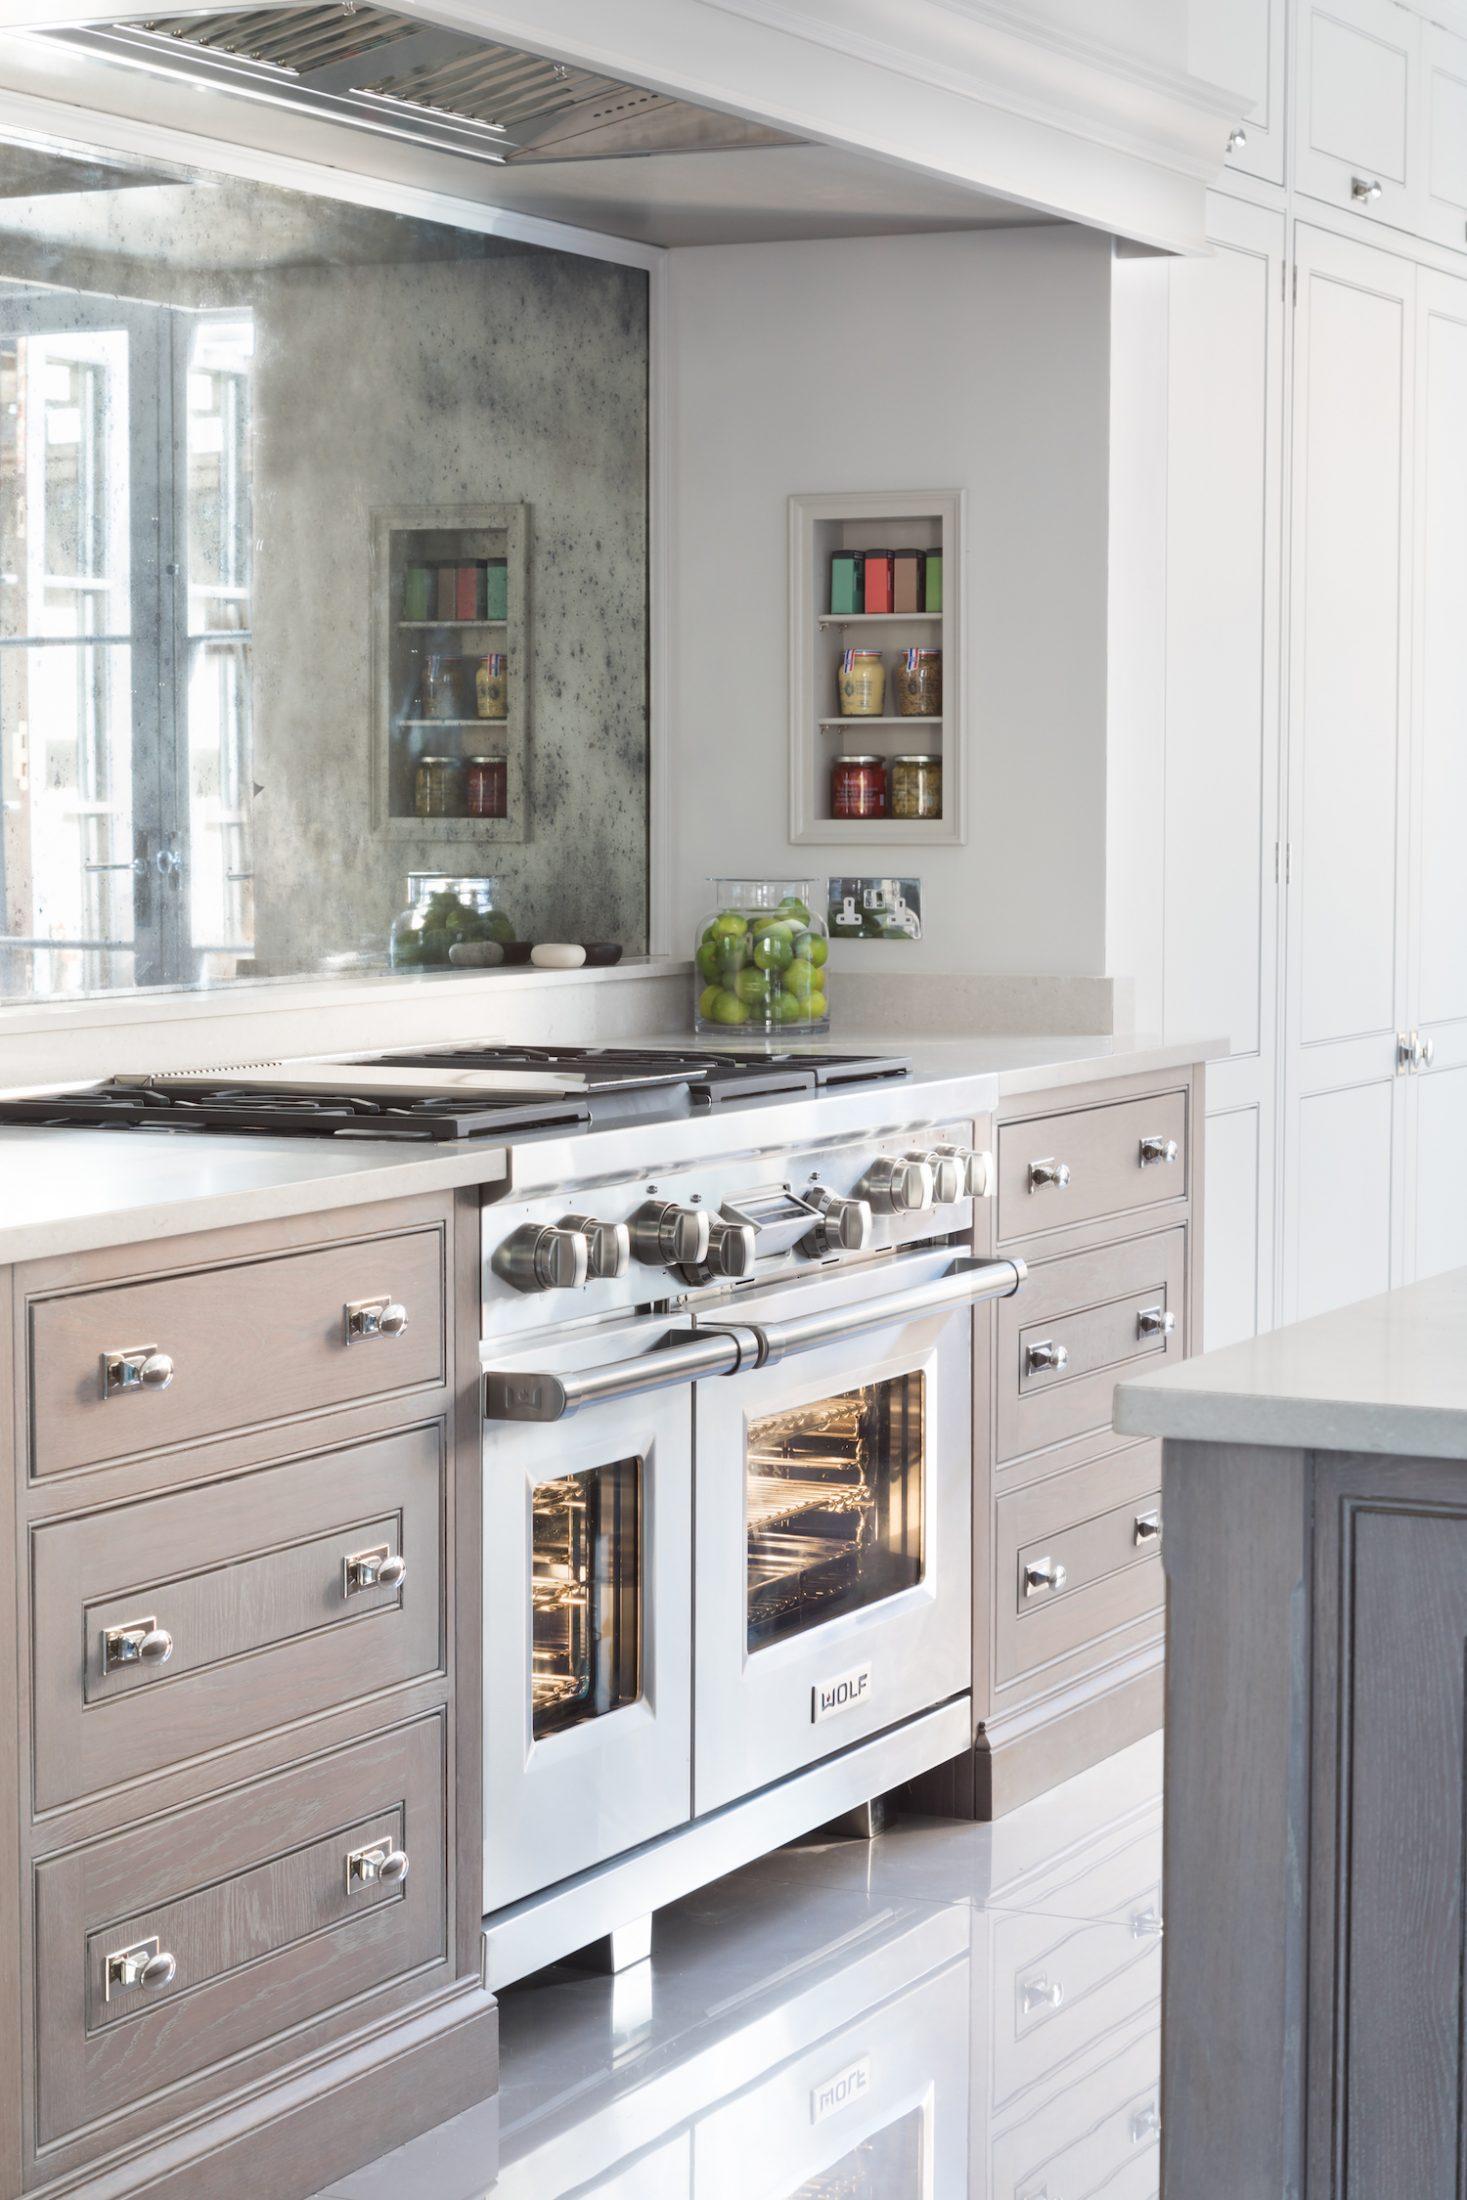 Epping Forest Project - Luxury Bespoke Kitchen - Humphrey Munson 43